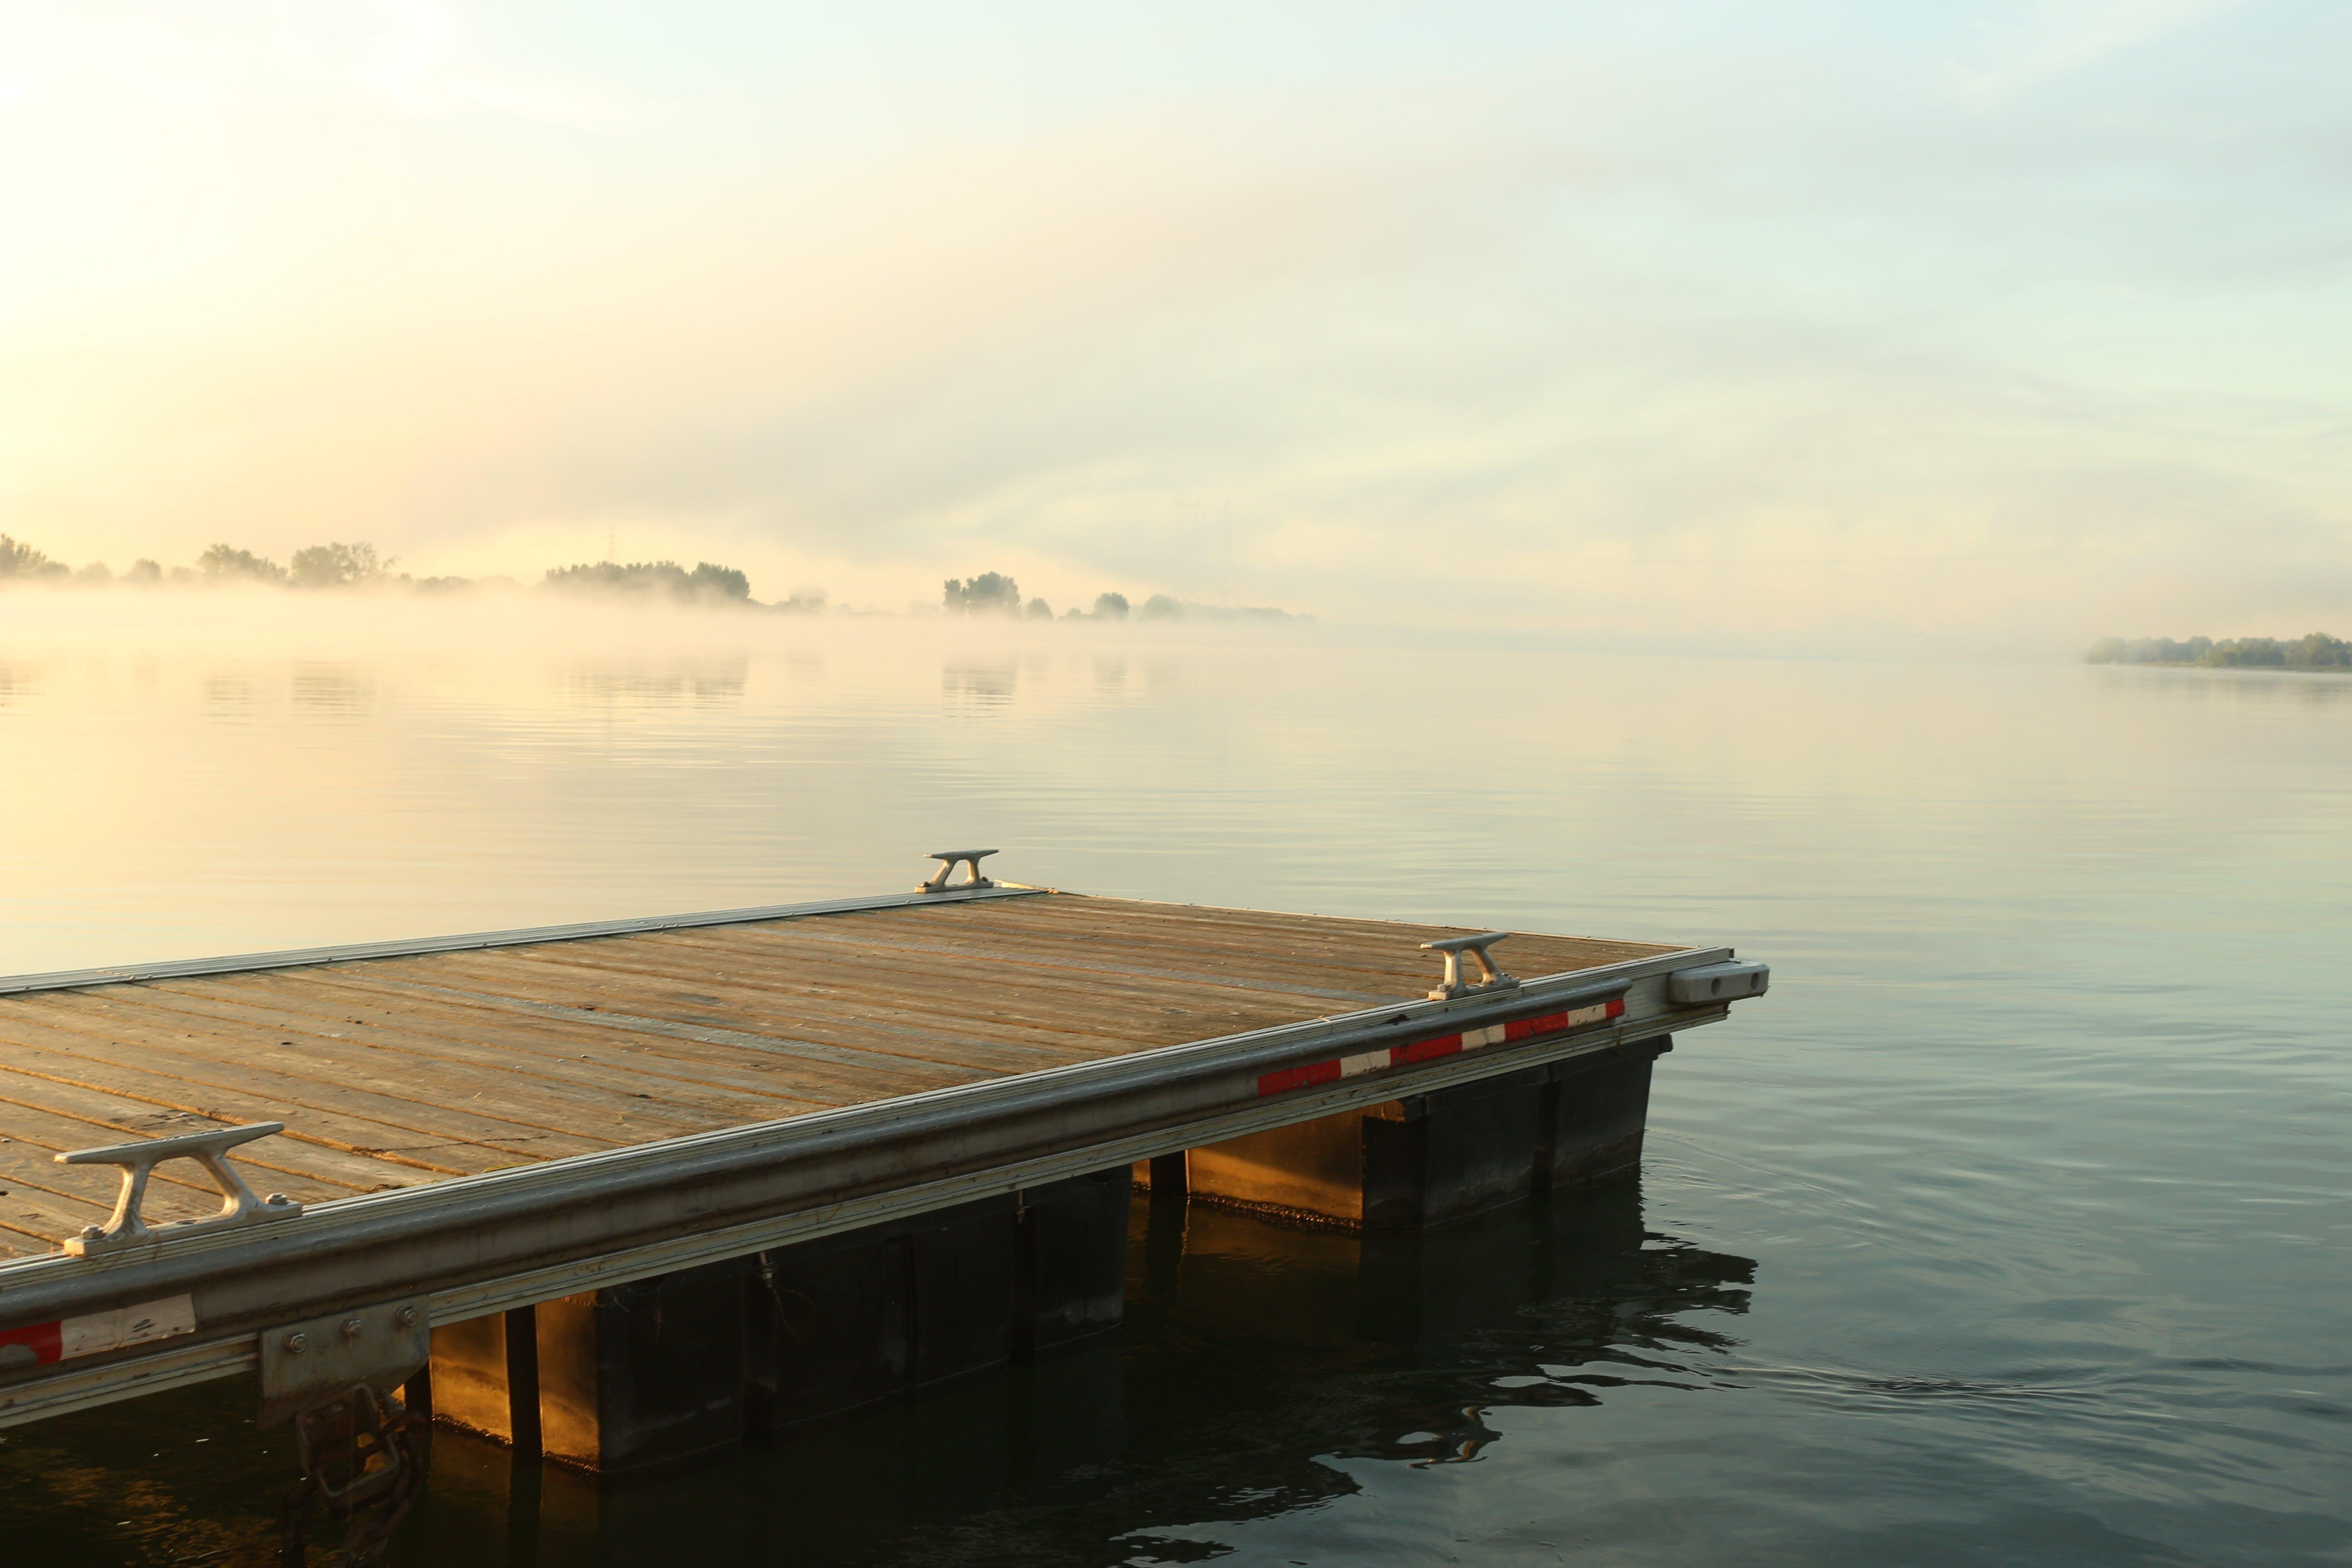 clouds, daylight, dock